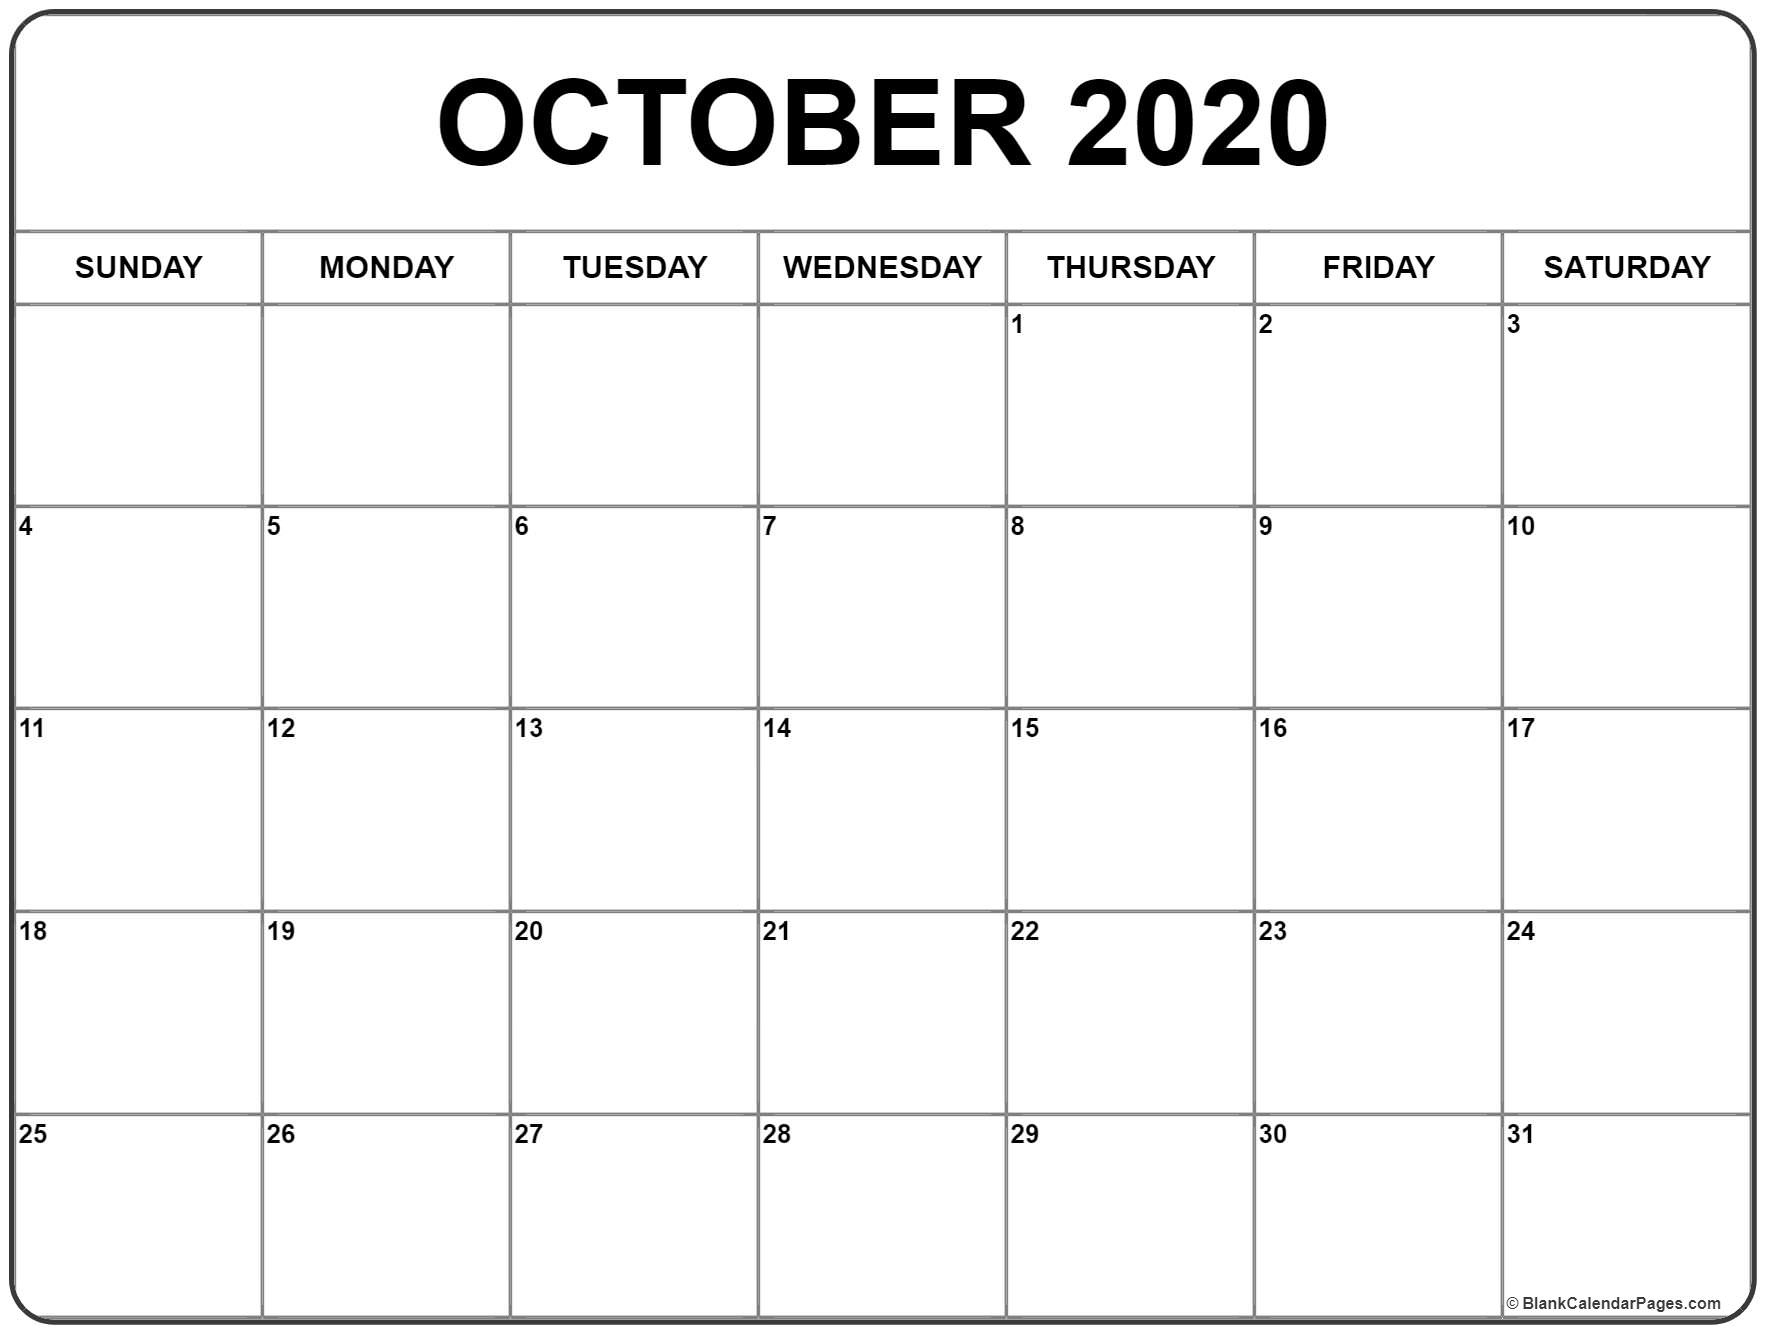 Blank Calendar October 2020 - Togo.wpart.co